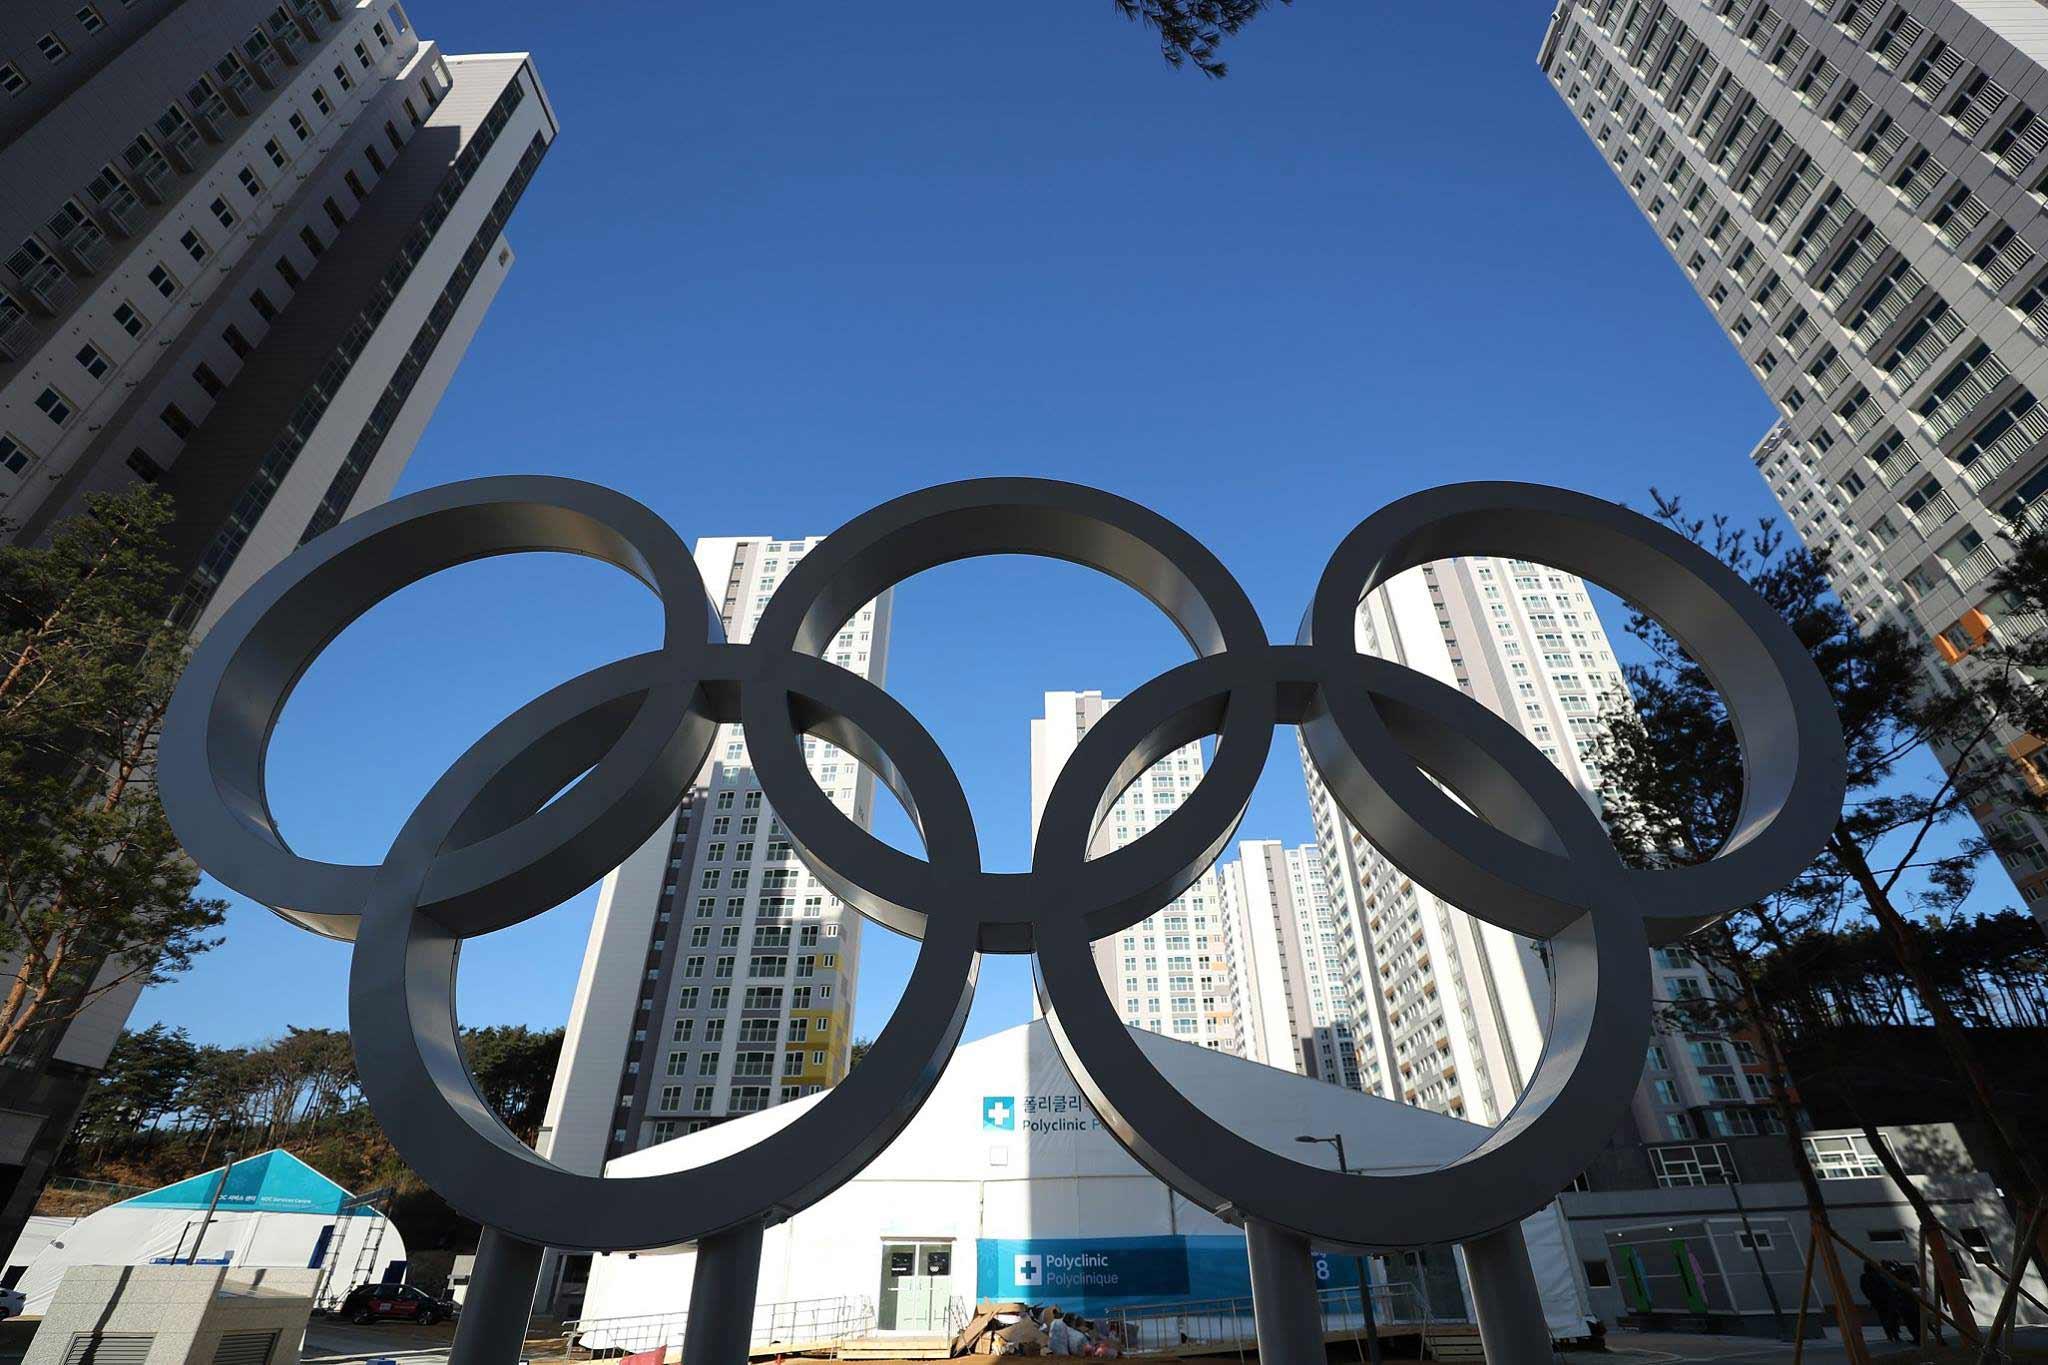 So sieht die deutsche Olympia 2018 Unterkunft aus - Foto: facebook.com/olympics